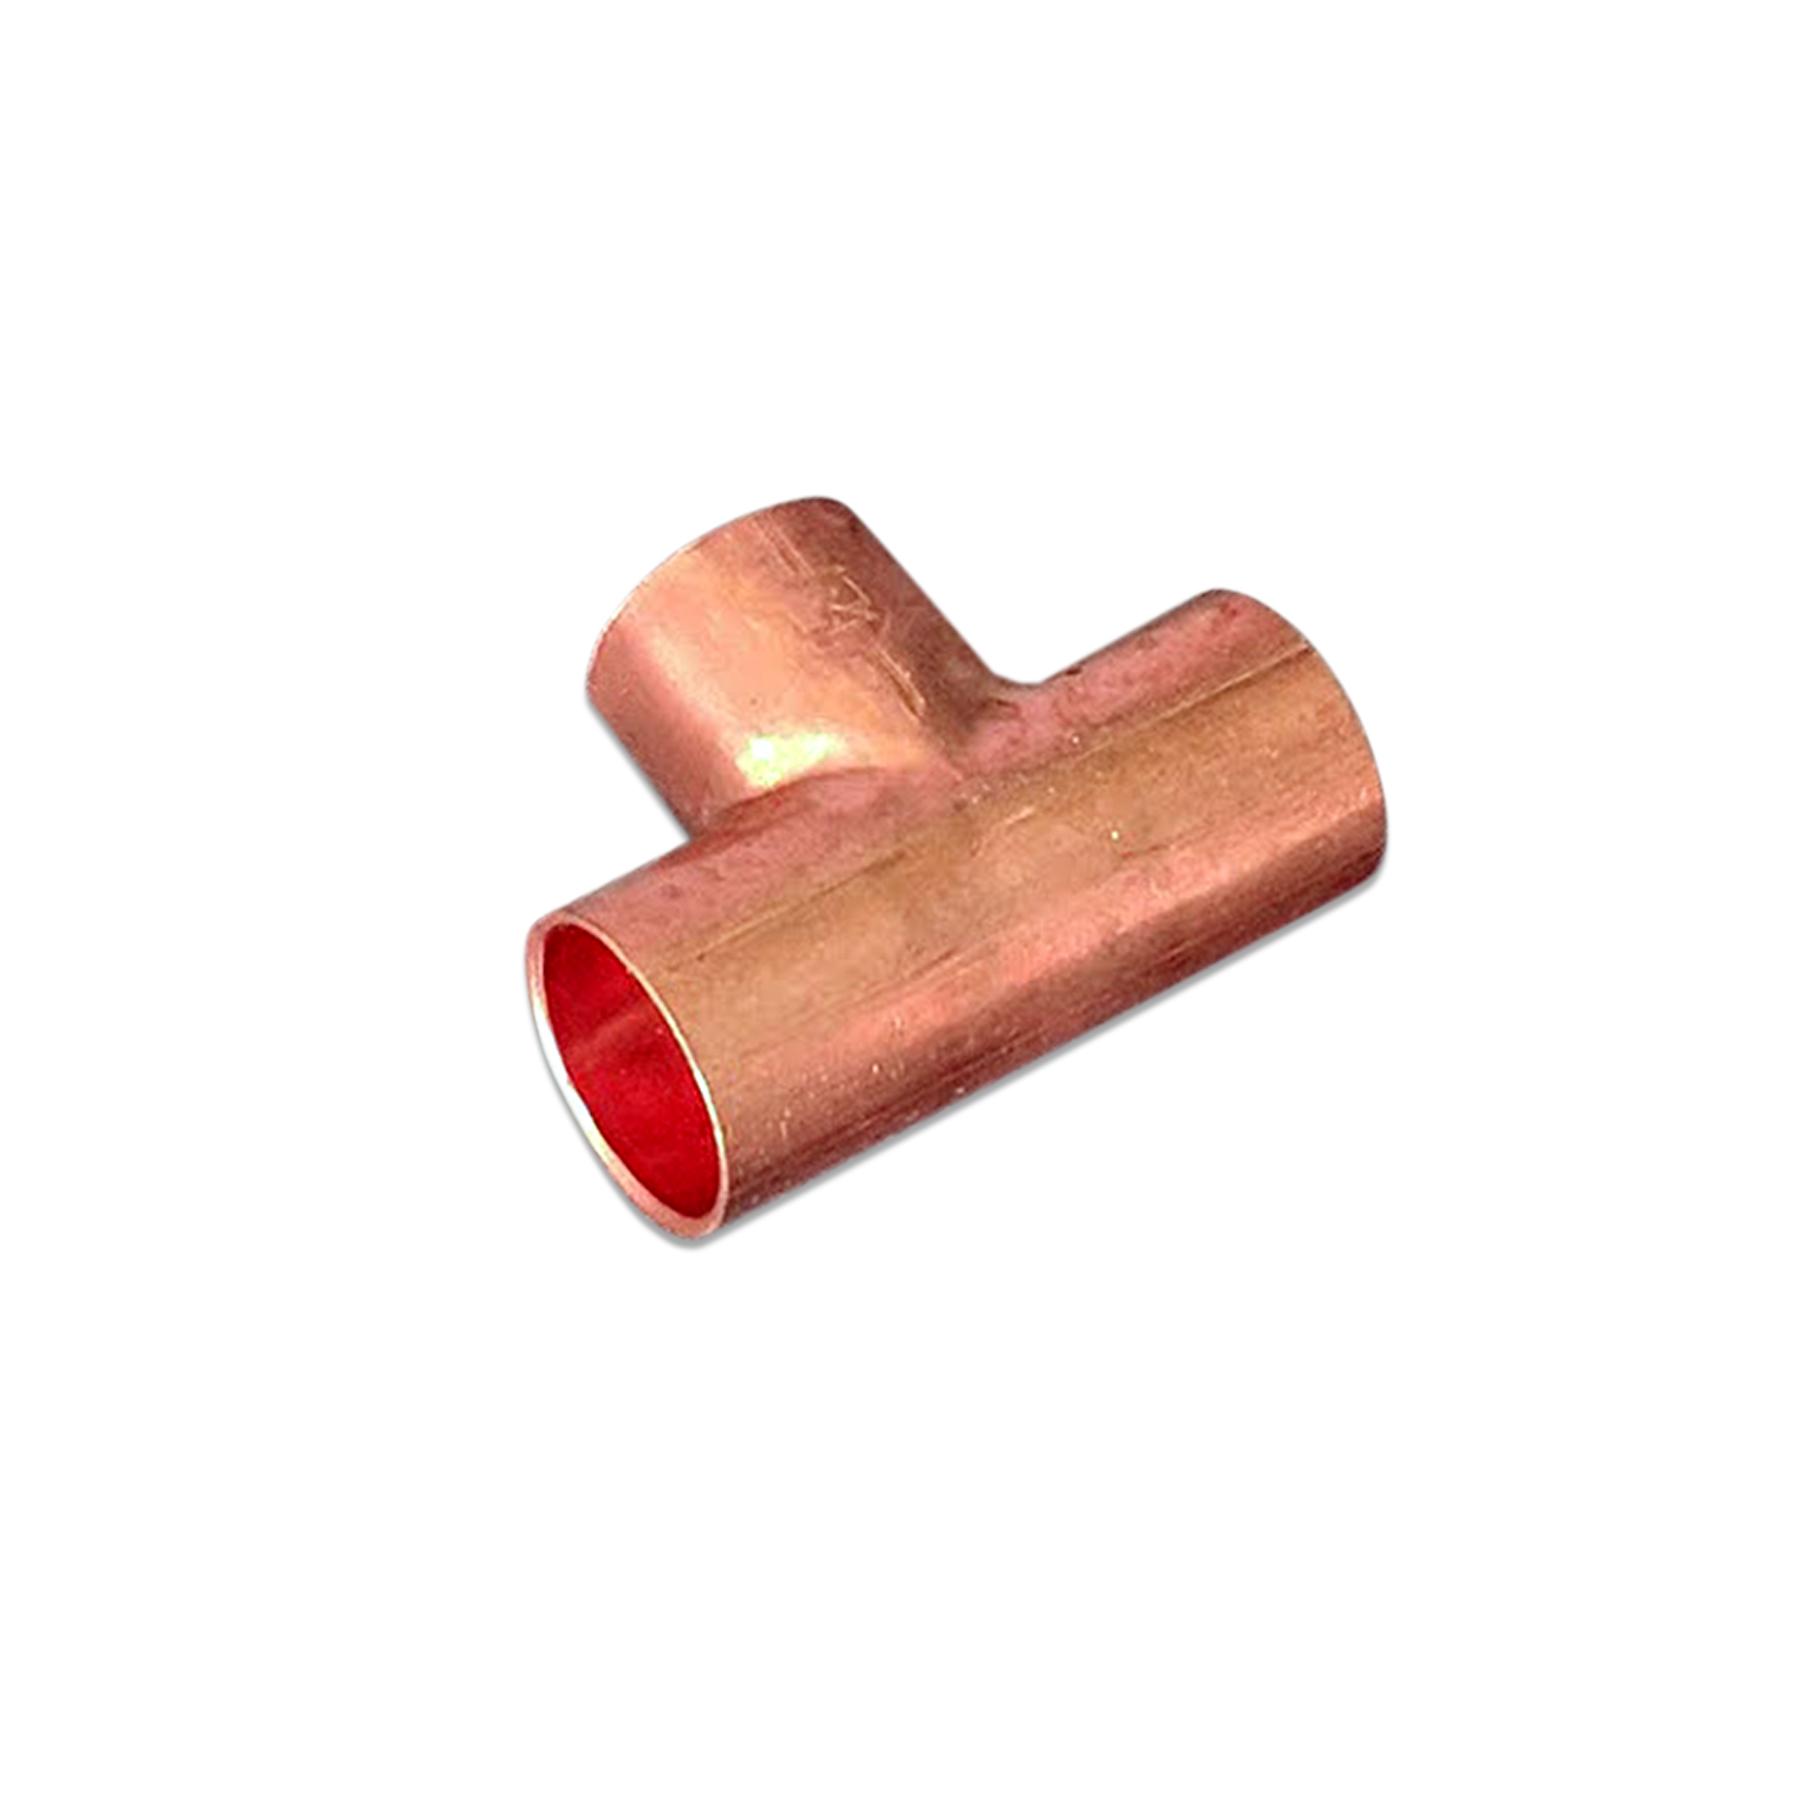 CONS Copper Tee Fitting, 1/2 x 1/2 x 1/2 (F) Sweat